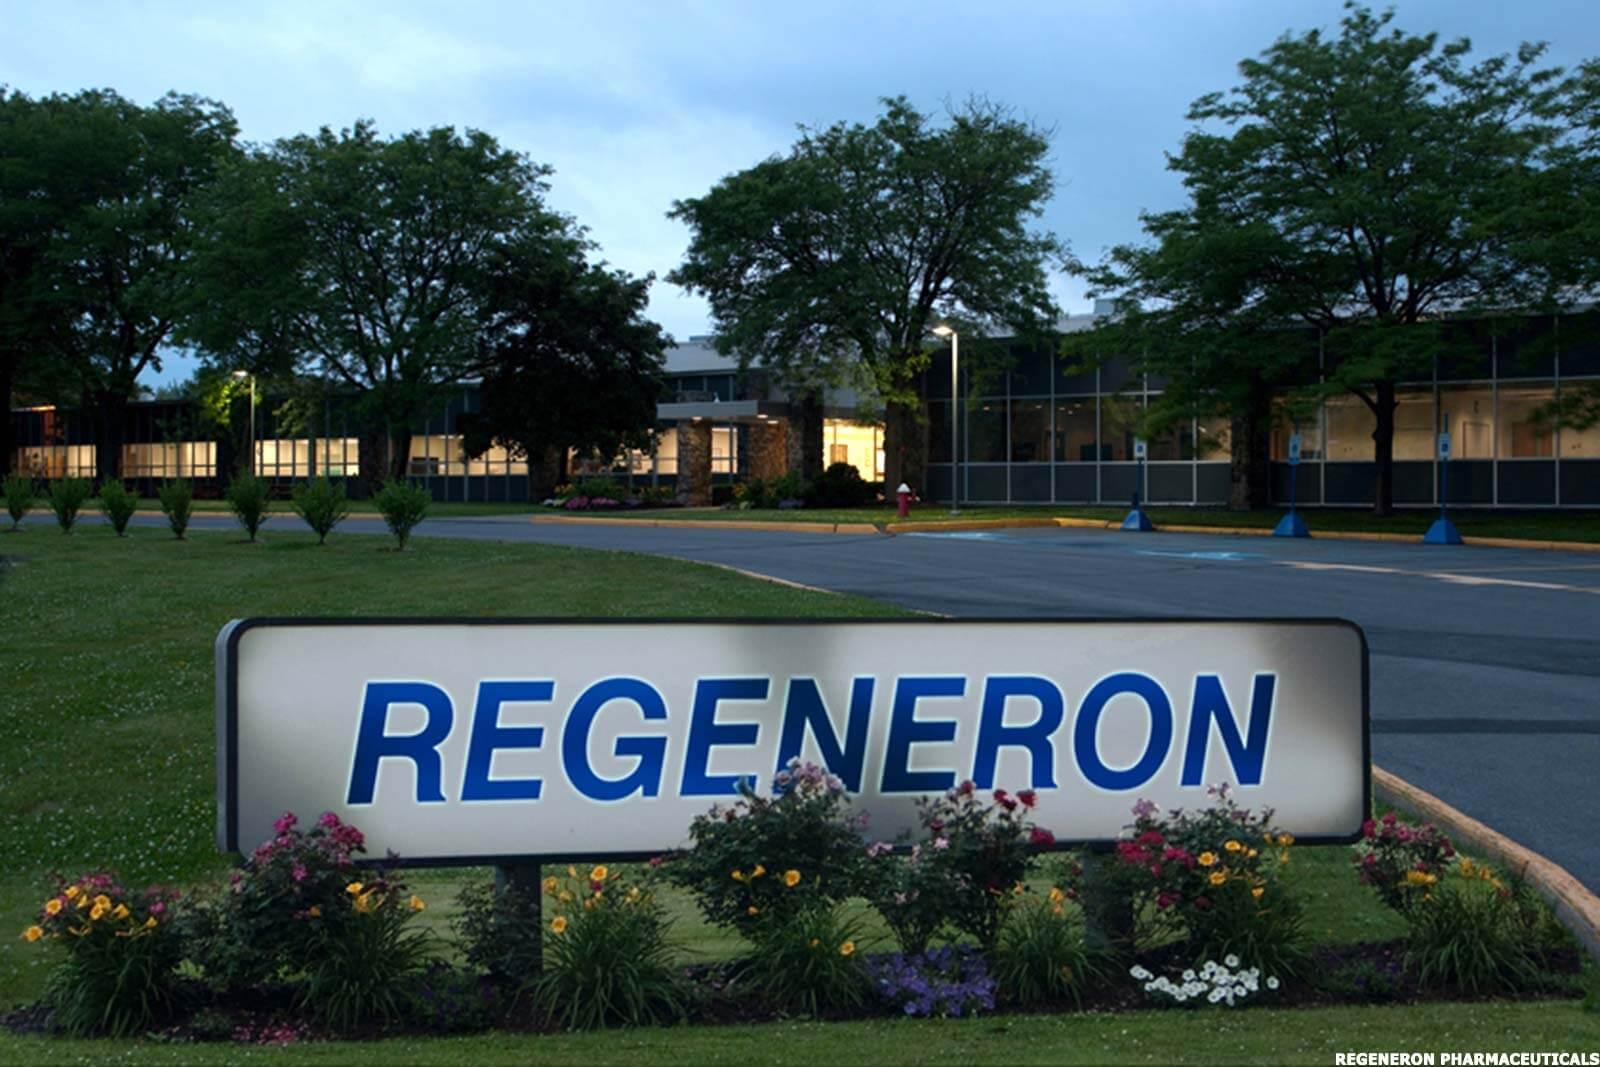 «Ридженерон фармасьютикалс» (Regeneron Pharmaceuticals).